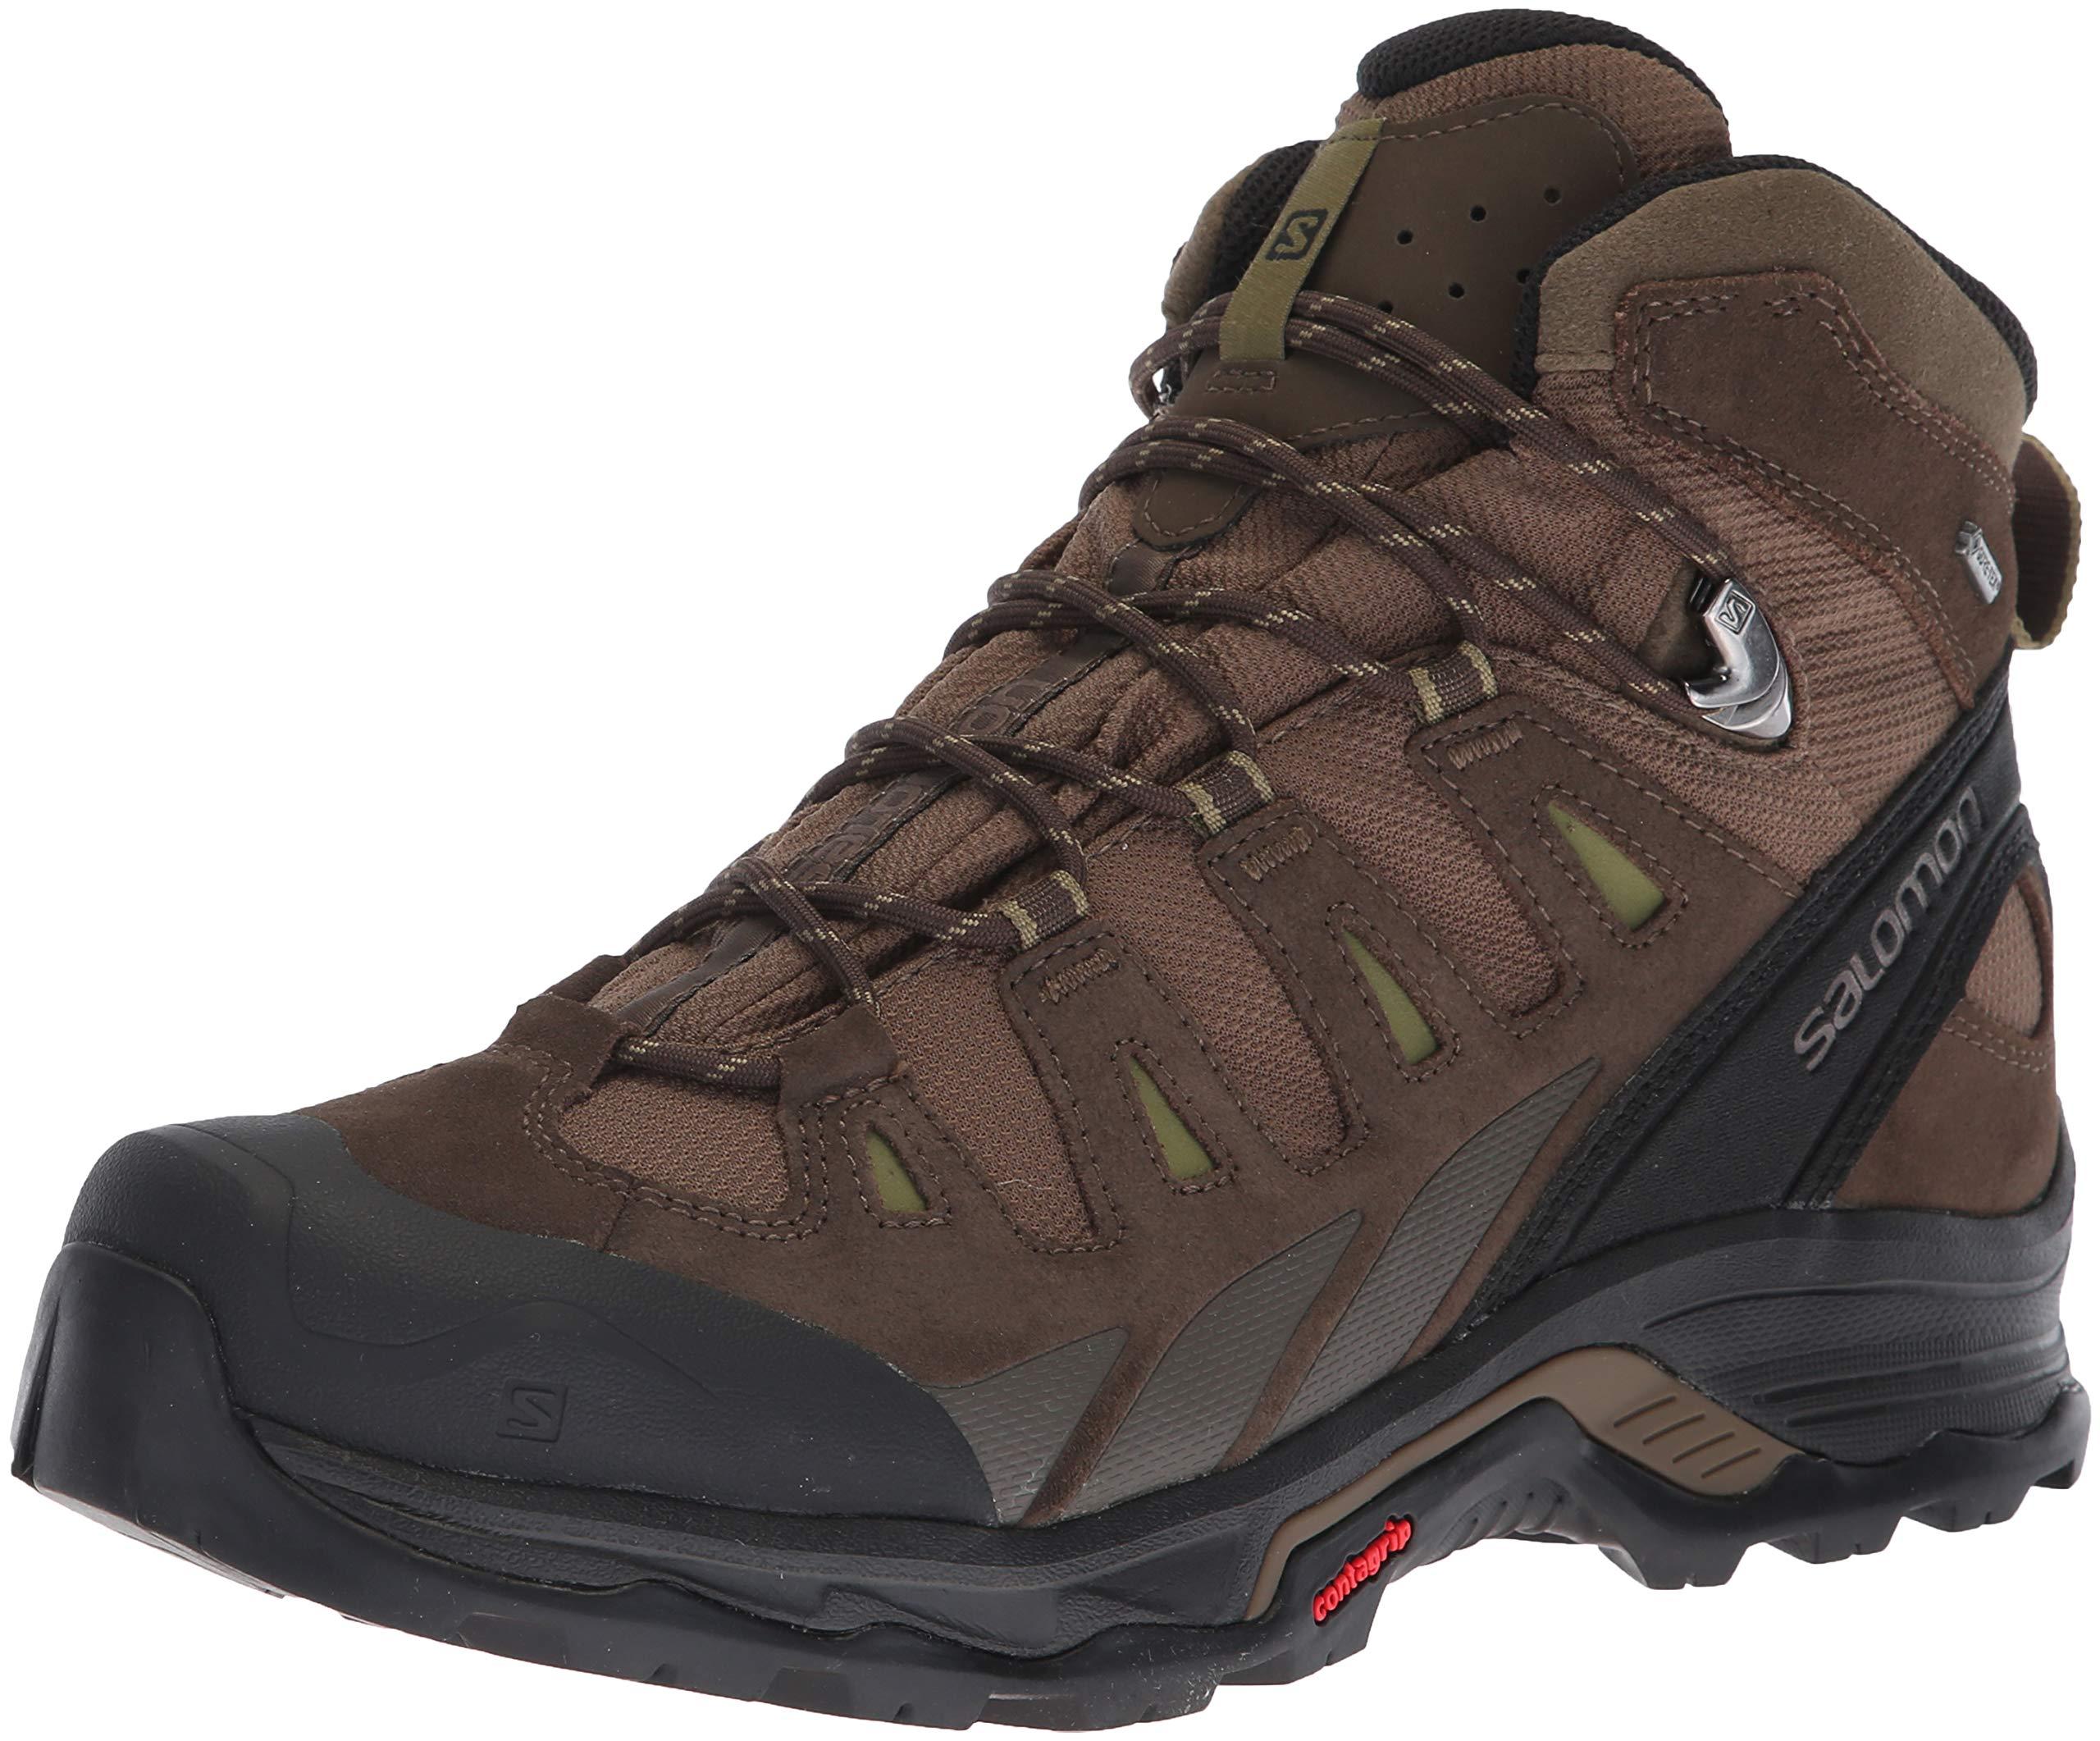 Salomon Men's Quest Prime GTX Backpacking Boot, Canteen/Wren/Martini Olive, 12 M US